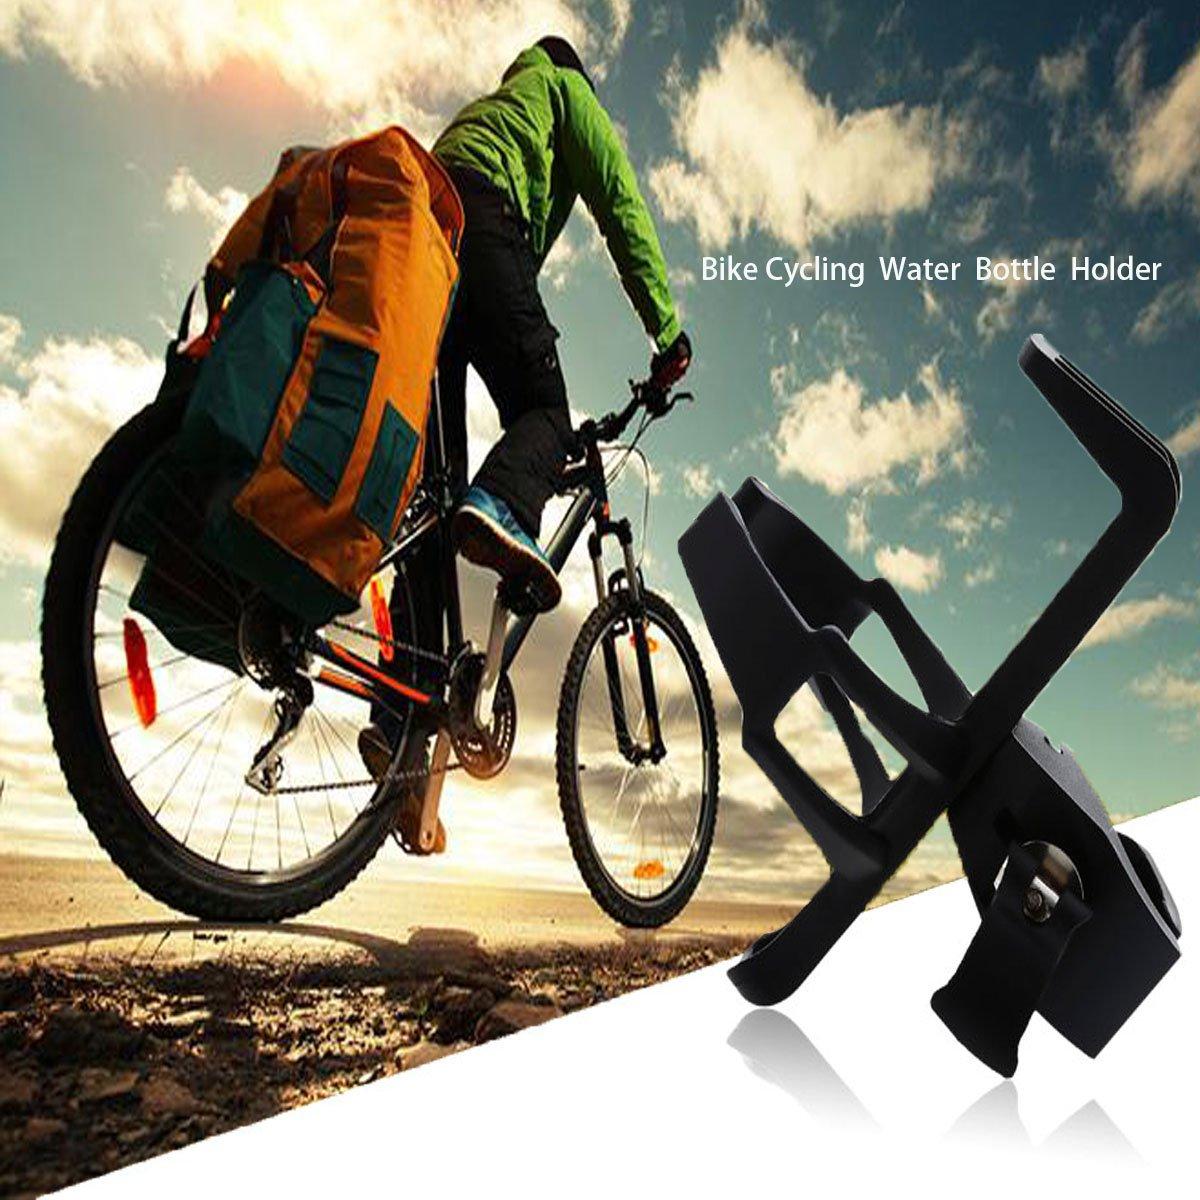 0d9ec3b0ba5 Amazon.com   Antia Teck Bike Bottle Motorcycle Beverage Holder - Bike Water  Bottle Cup Holder - Rubber Pad Beverage Holder - Quick Install   Sports    ...